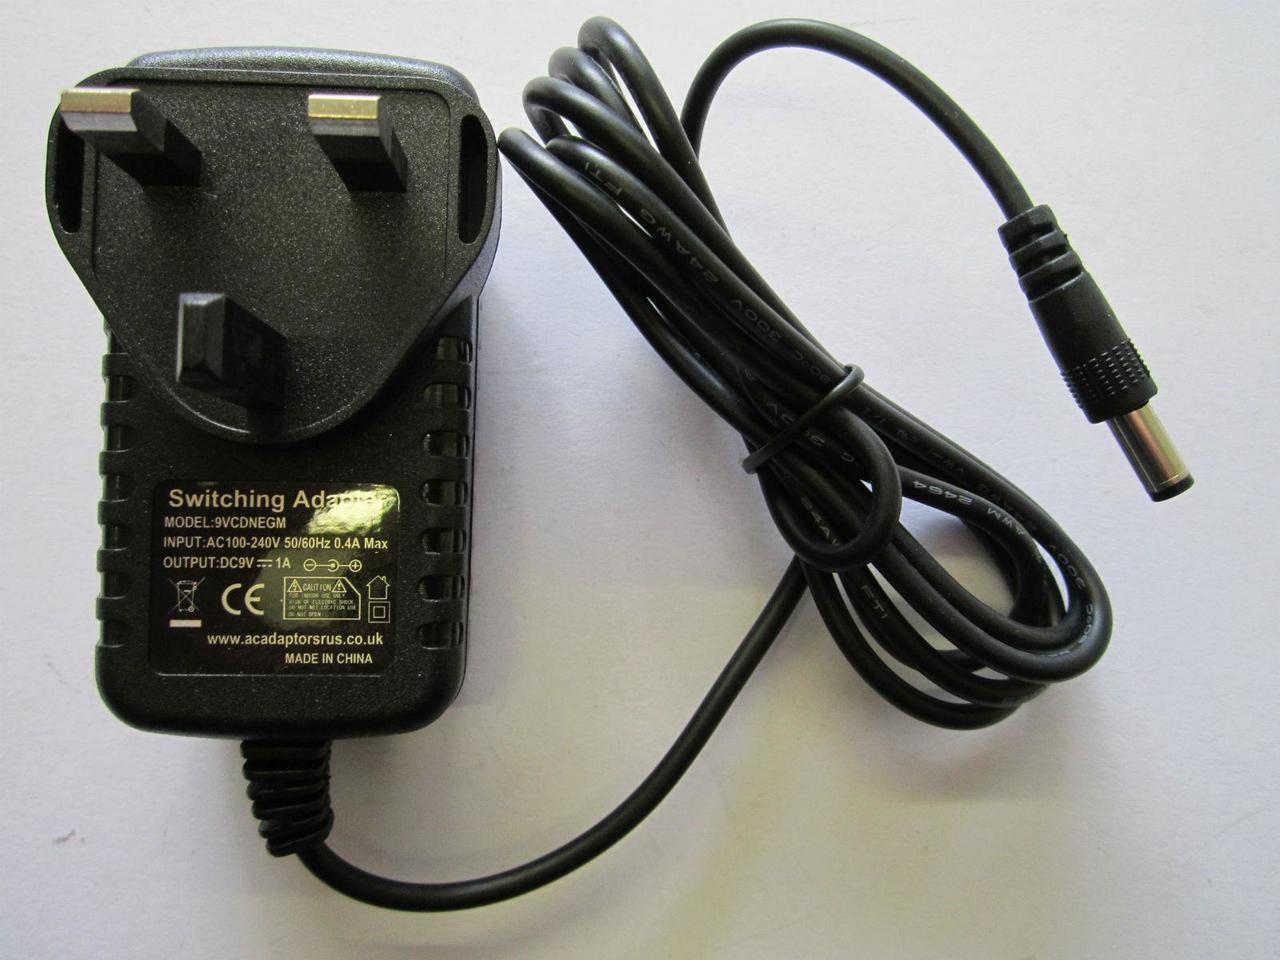 9V Negative Polarity AC Power Adaptor 6 3mm x 3 0mm for PC Engine SuperGrafx